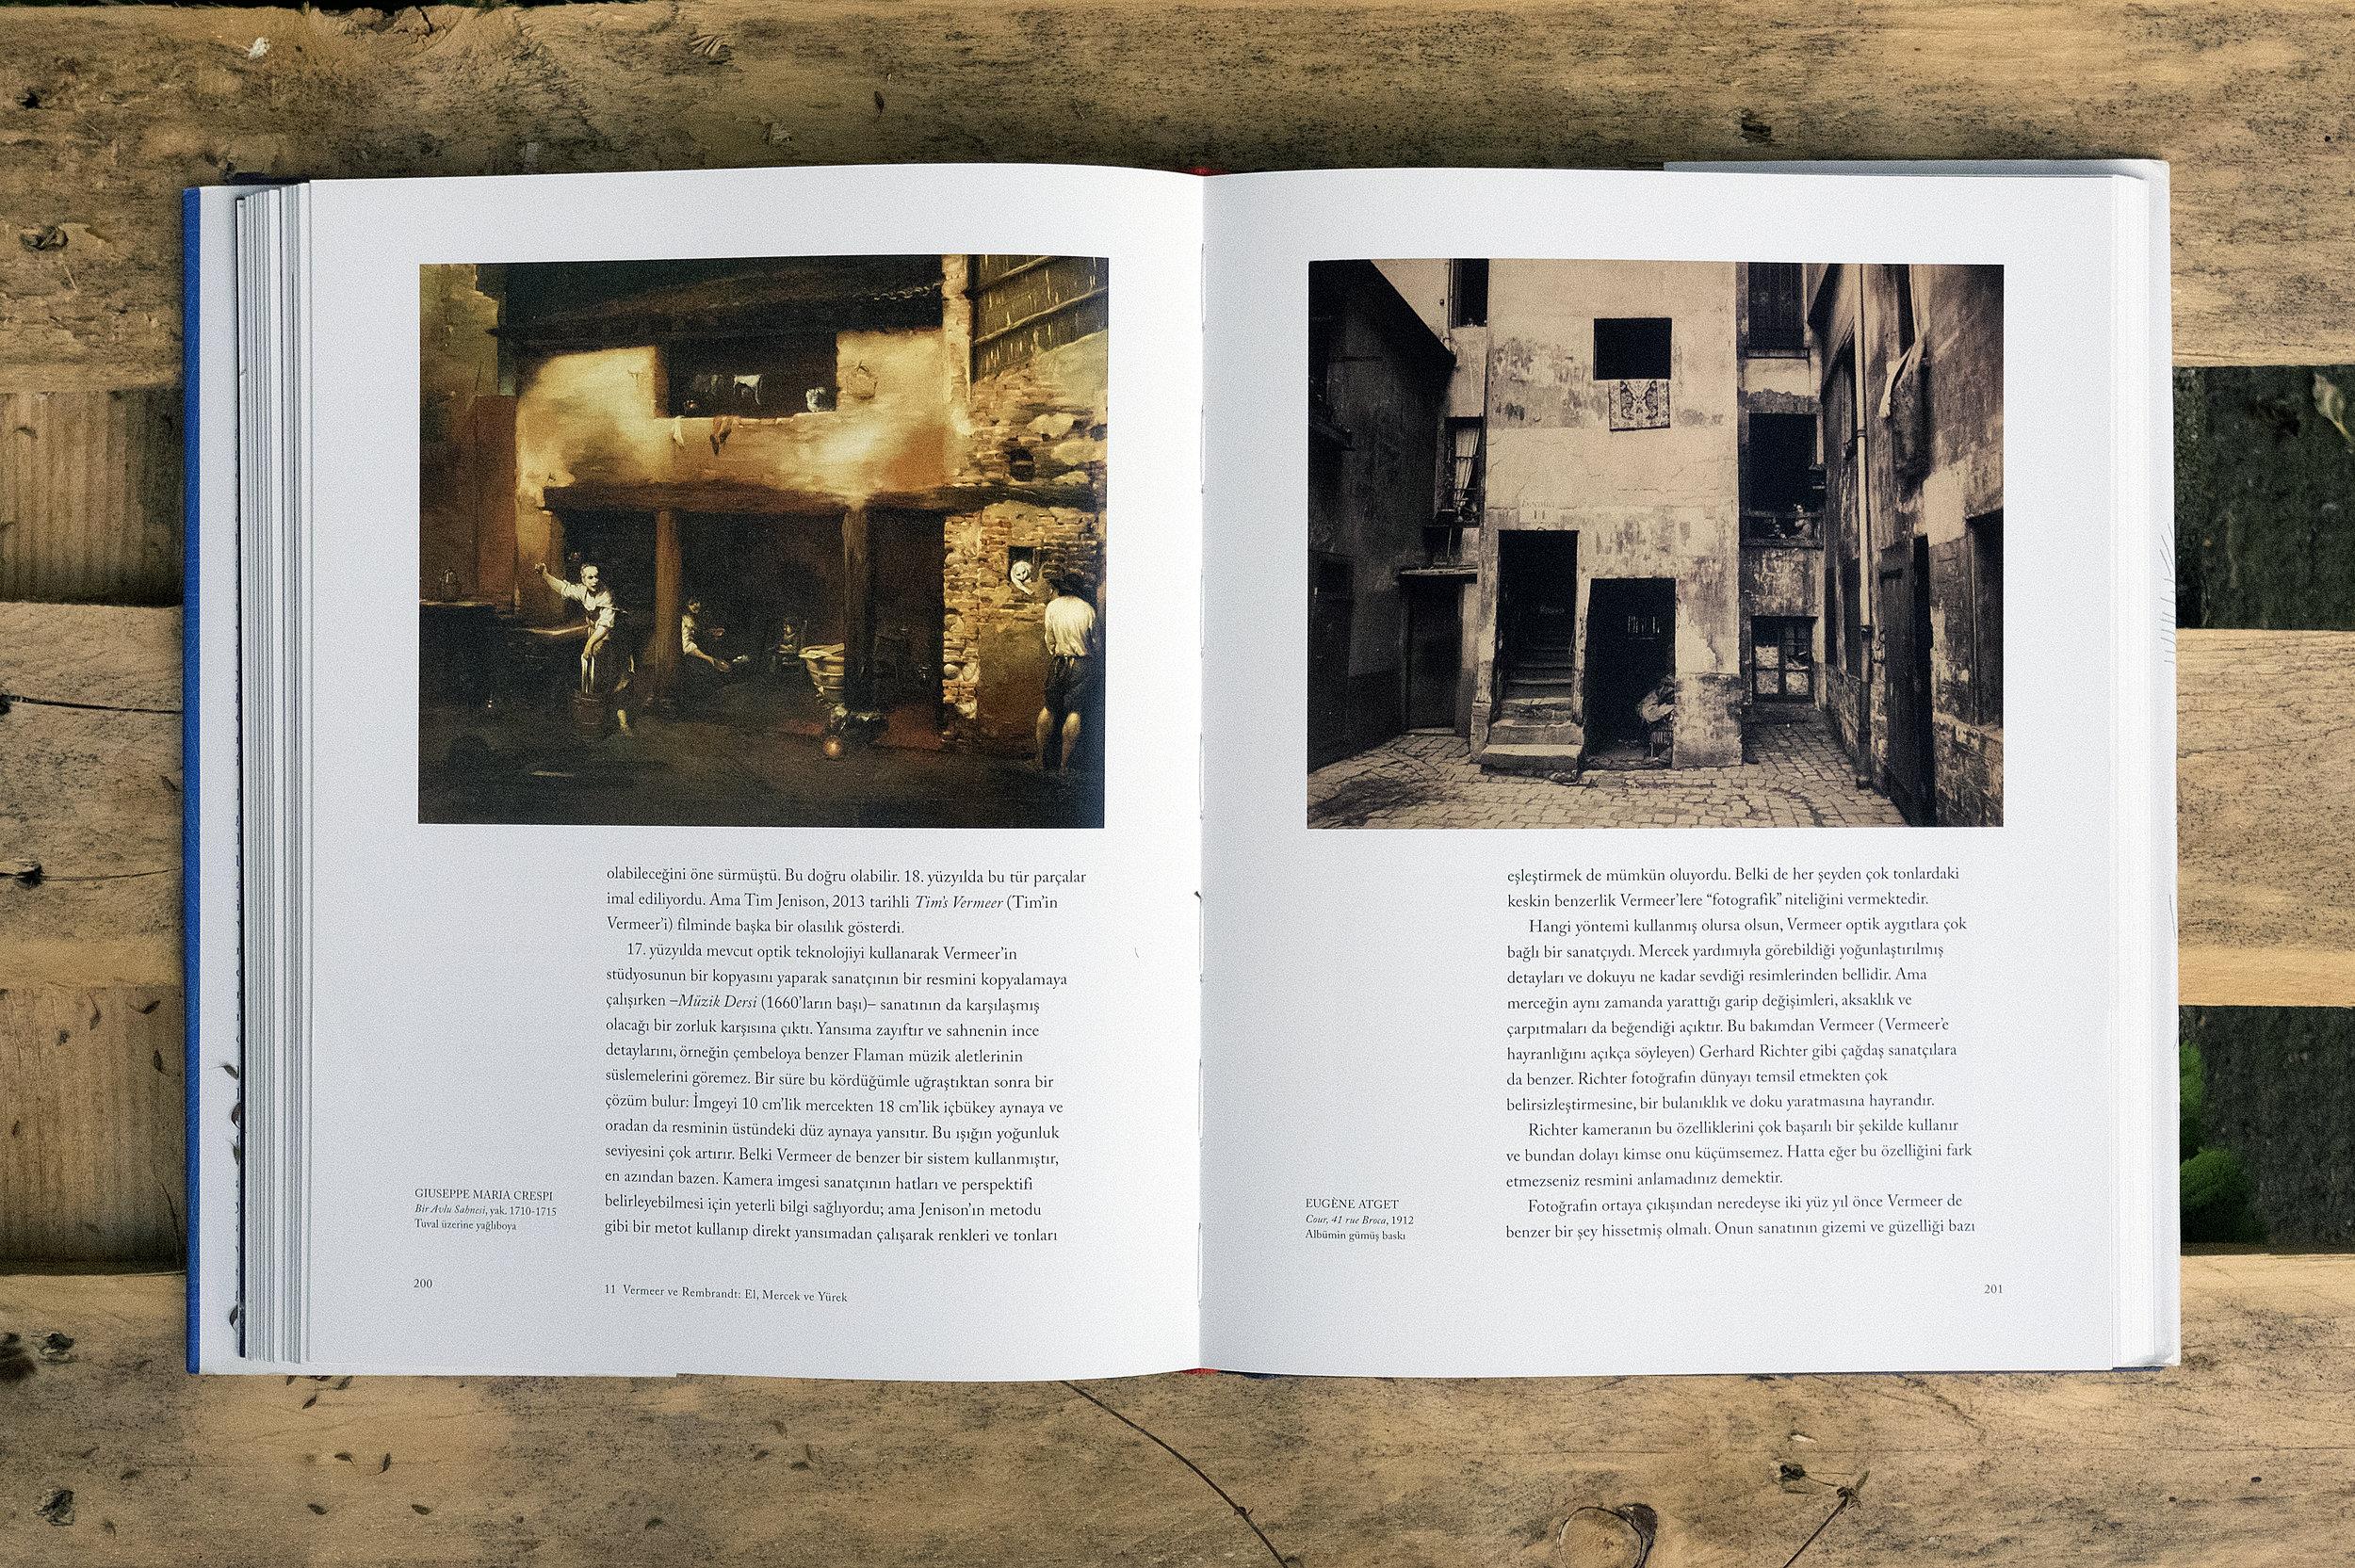 A History of Pictures, David Hockney and Martin Gayford, Y.K.Y. Publishing. Photos: Zeynep Beler.